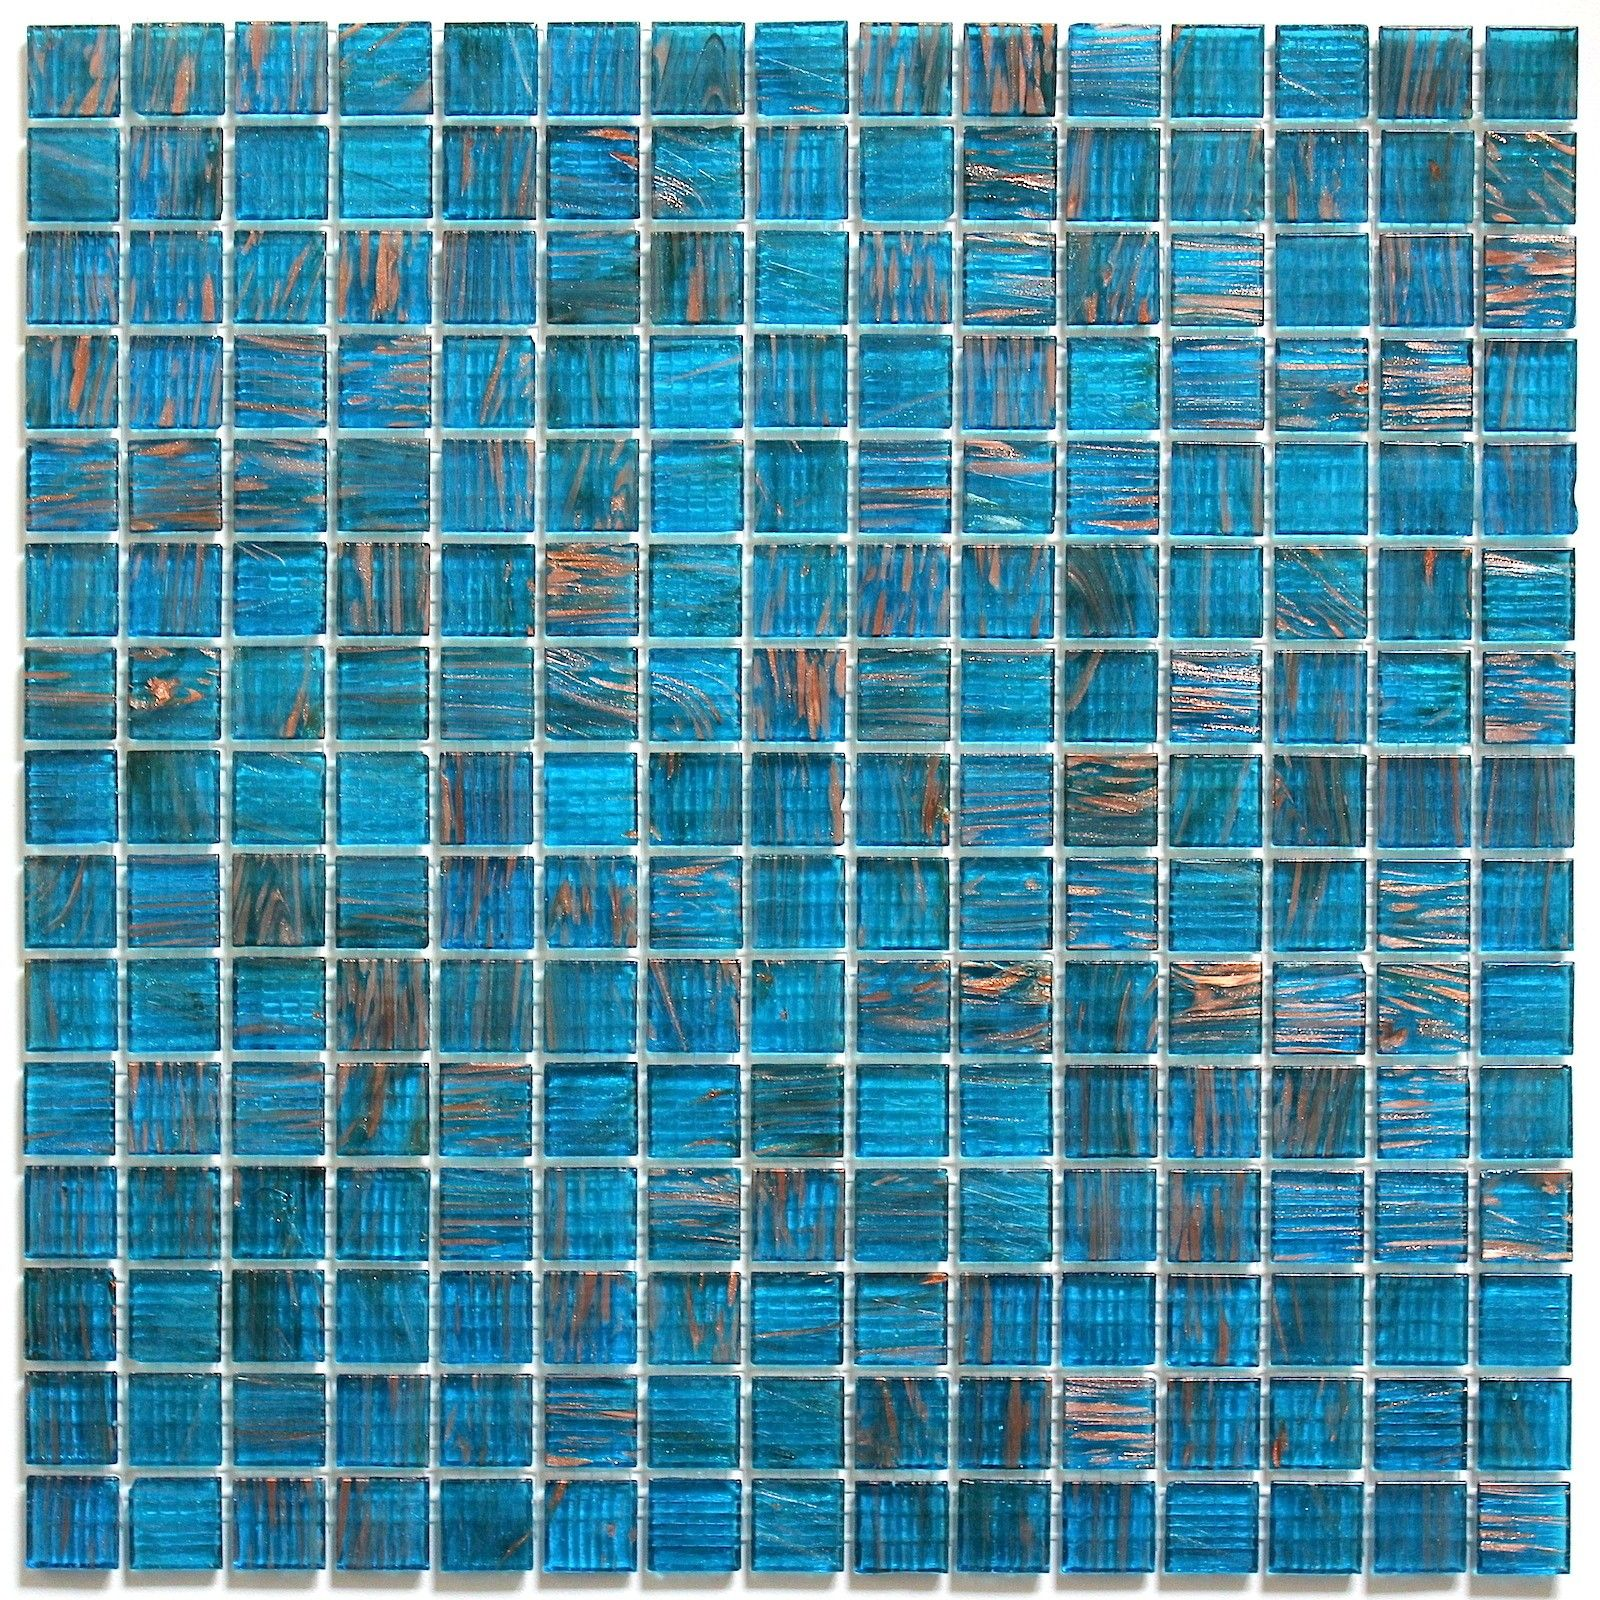 Mosaique Piscine Salle De Bain Douche Vitro Bleu Carrelage Mosaique Mosaique Piscine Carrelage Mosaique Salle De Bain Douche